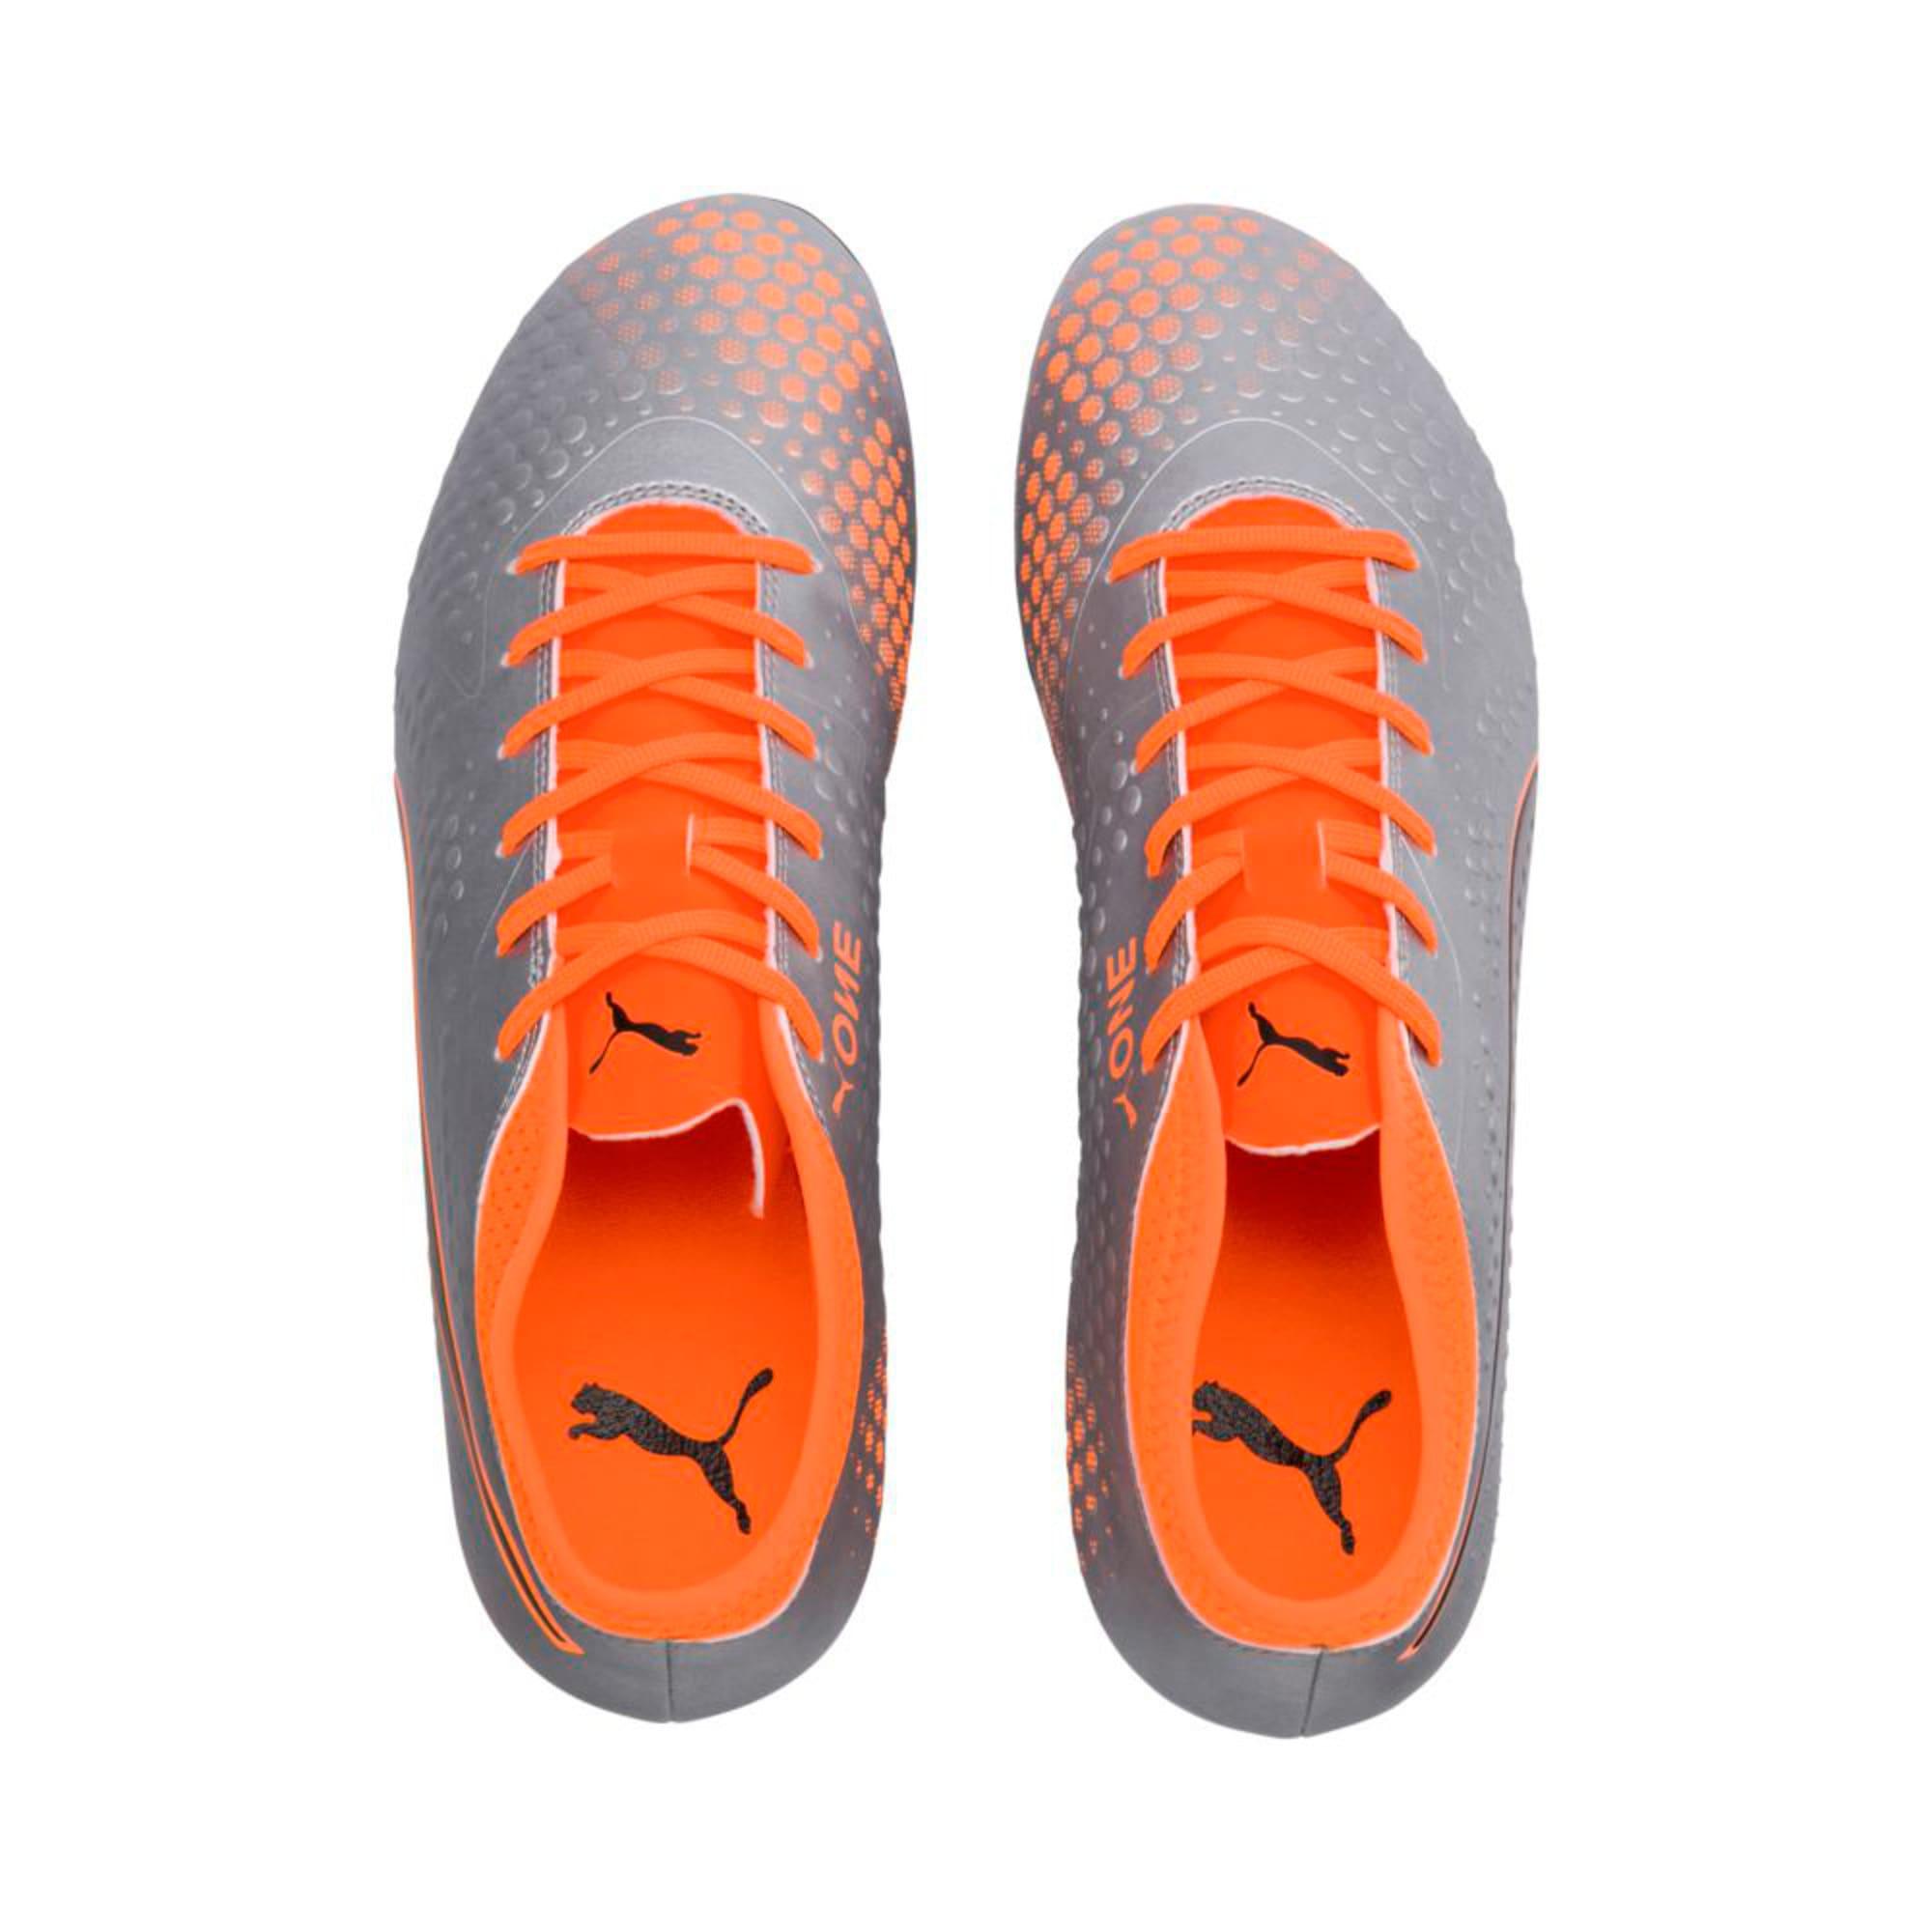 Thumbnail 3 of PUMA ONE 4 Synthetic FG Men's Football Boots, Silver-Orange-Black, medium-IND